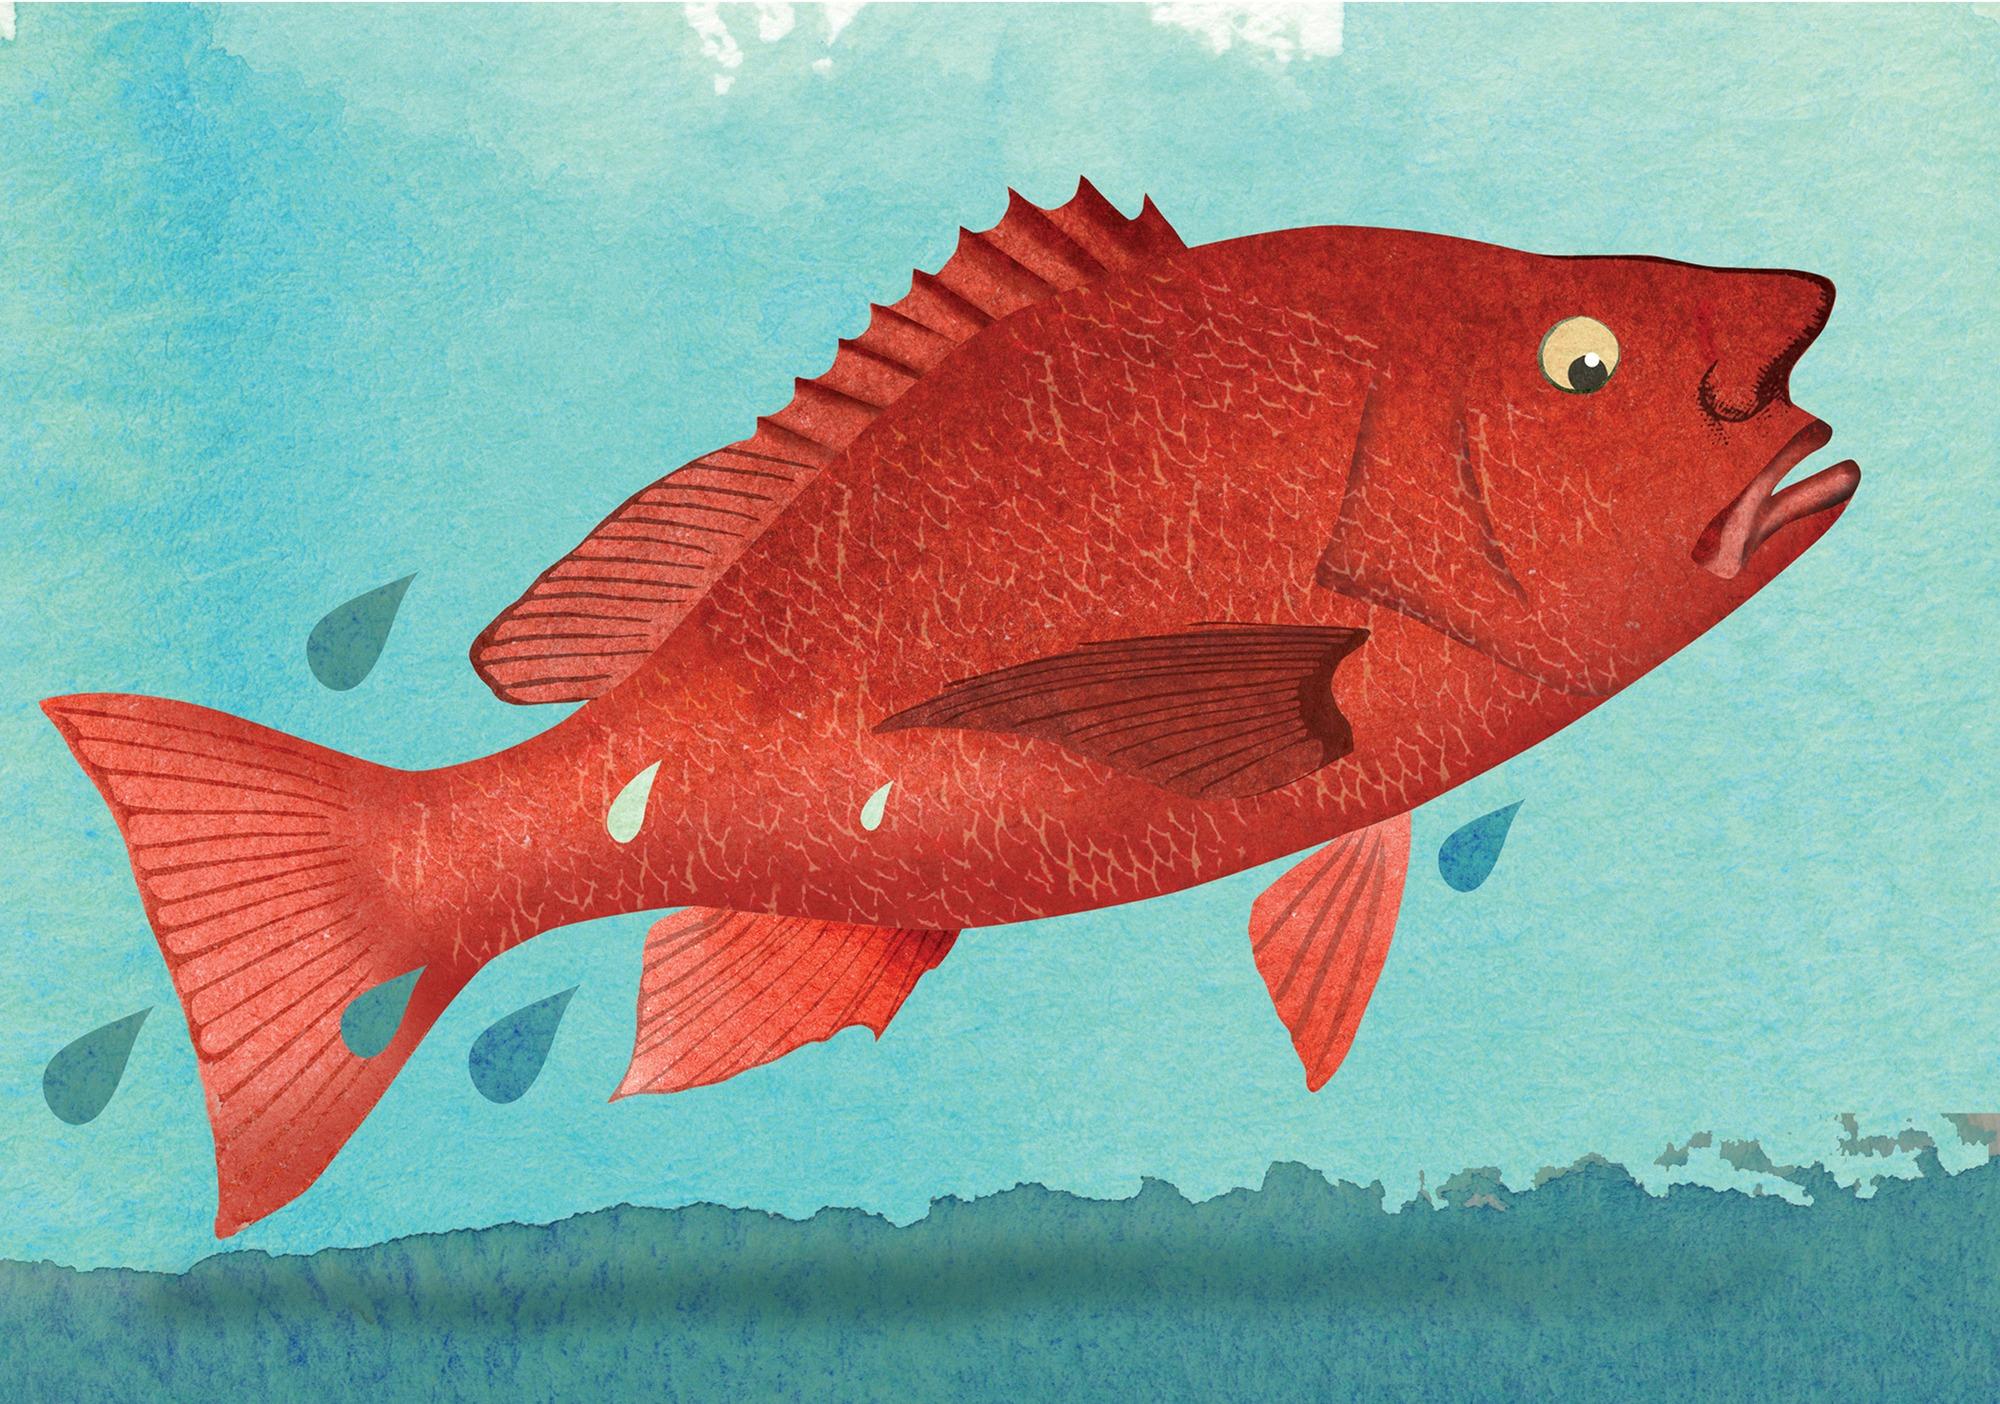 fish fear wall mural fish fear wallpaper diving coral fish wall mural muralswallpaper co uk